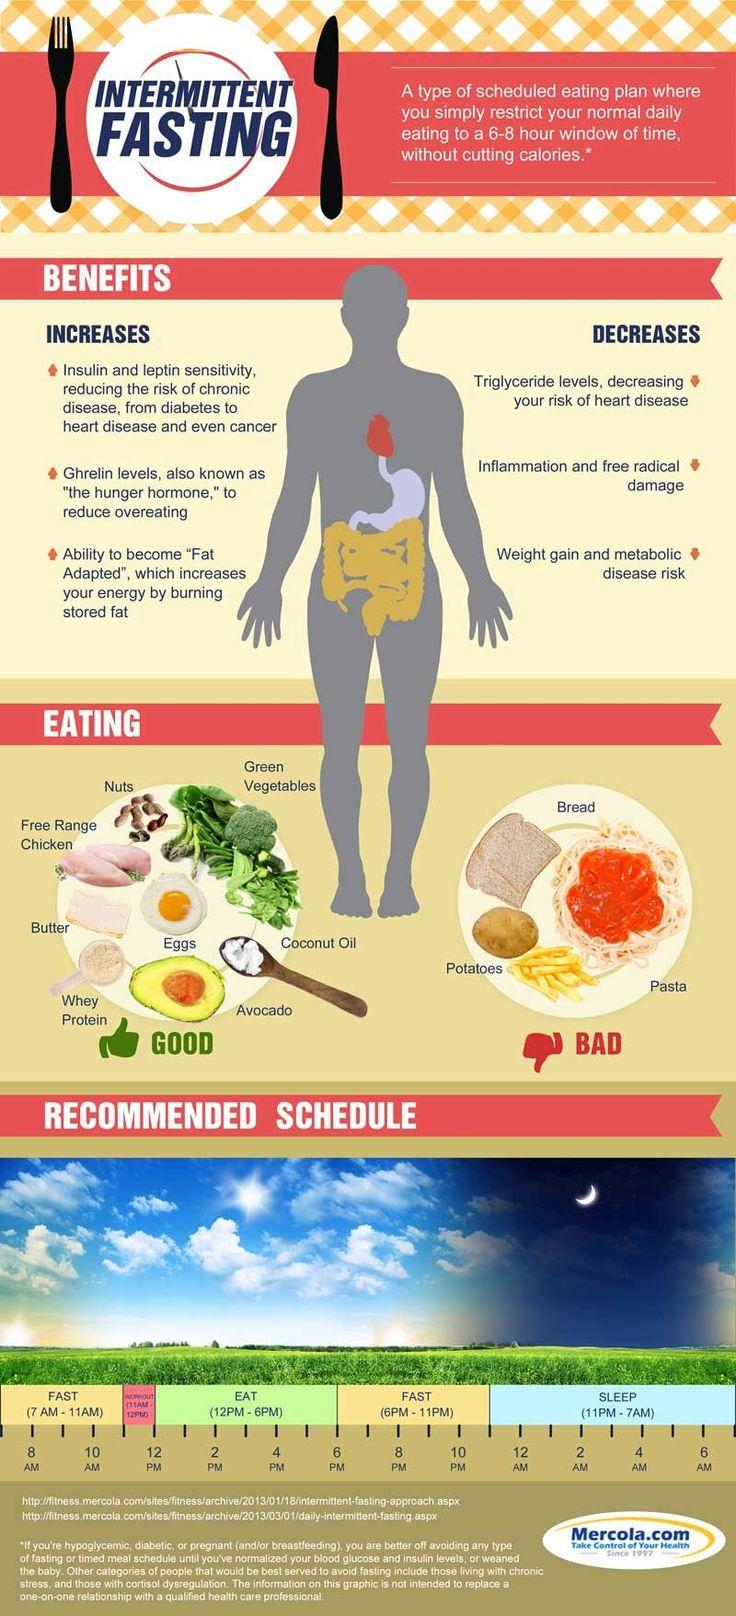 WEDNESDAY WEIGHT: Week 5 - intermittent fasting